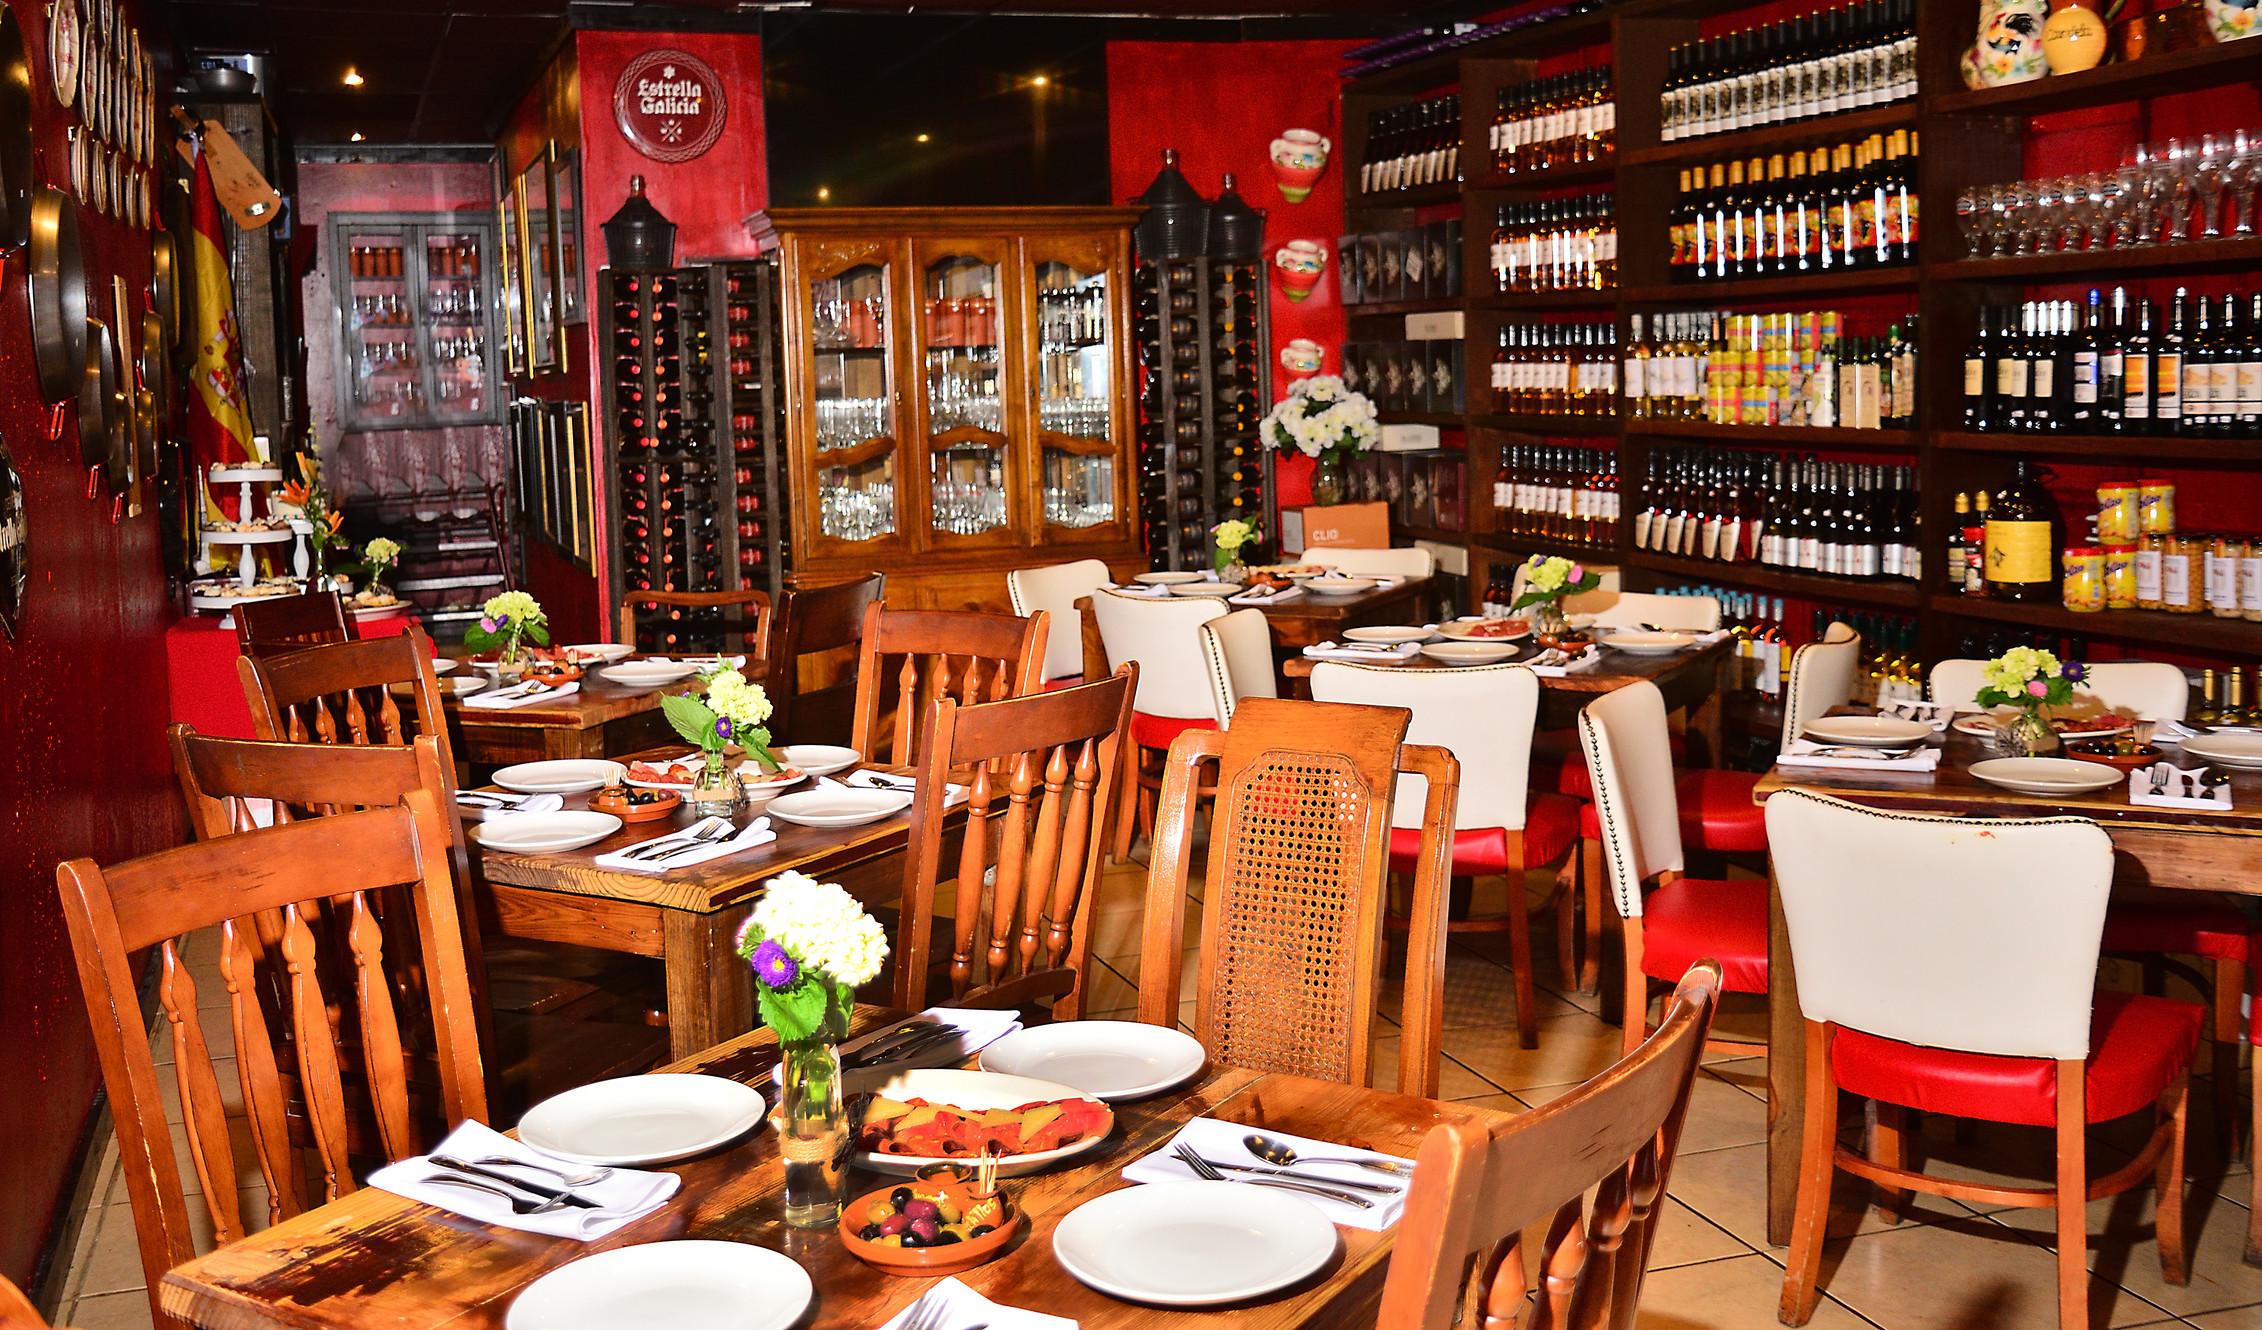 Candela Spanish Restaurant Wine Tapas Paella